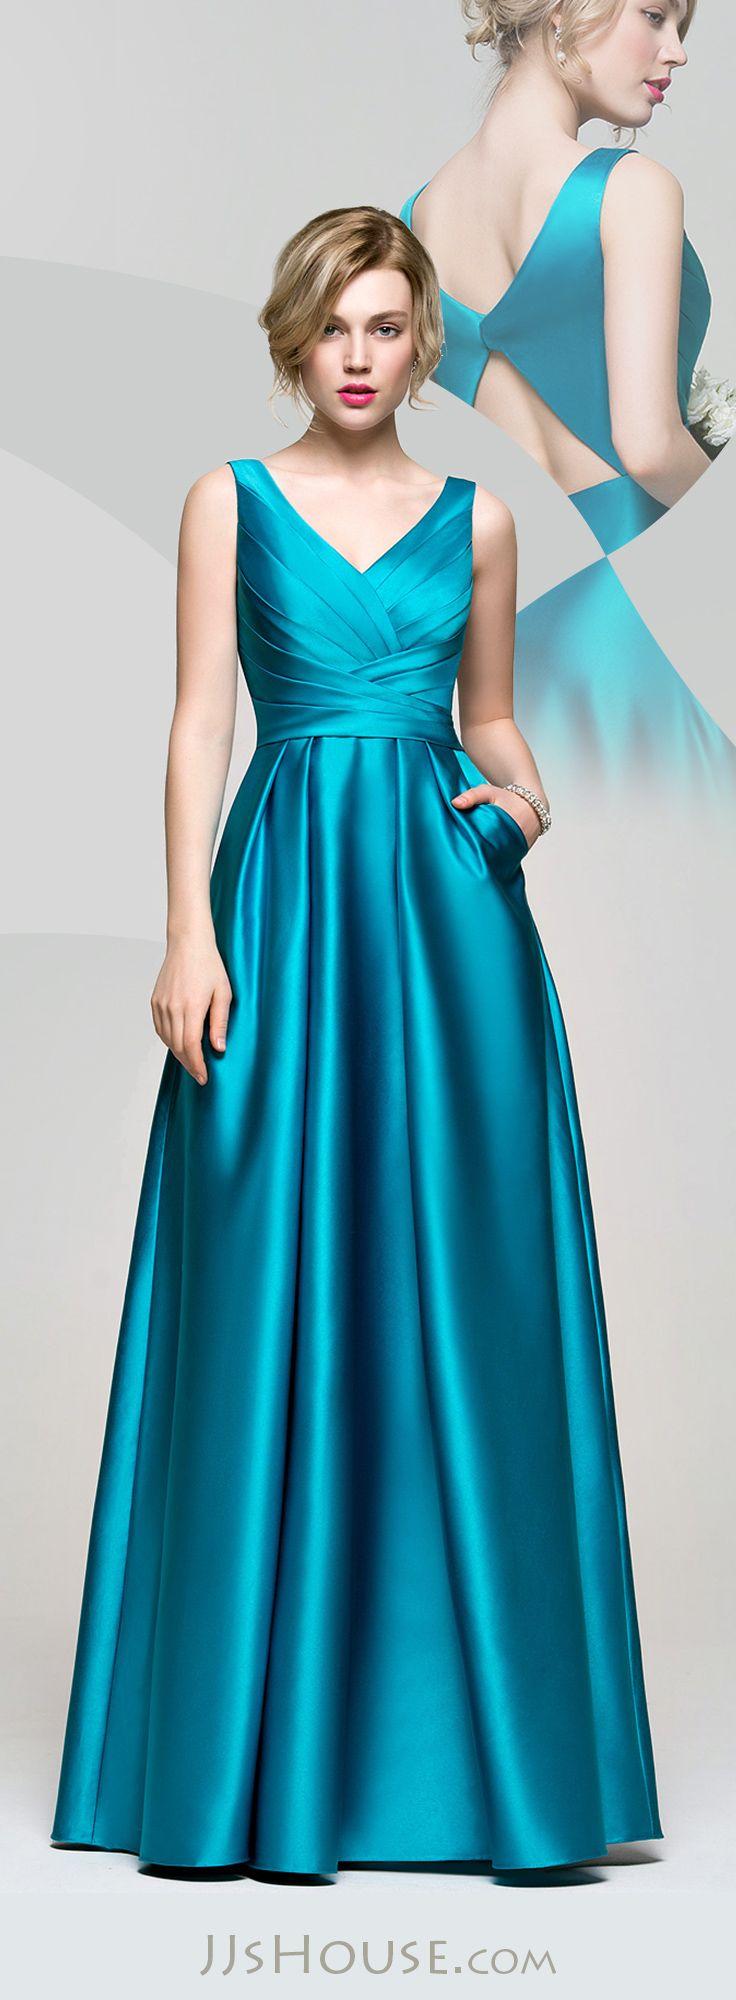 Best 25+ Satin bridesmaid dresses ideas on Pinterest